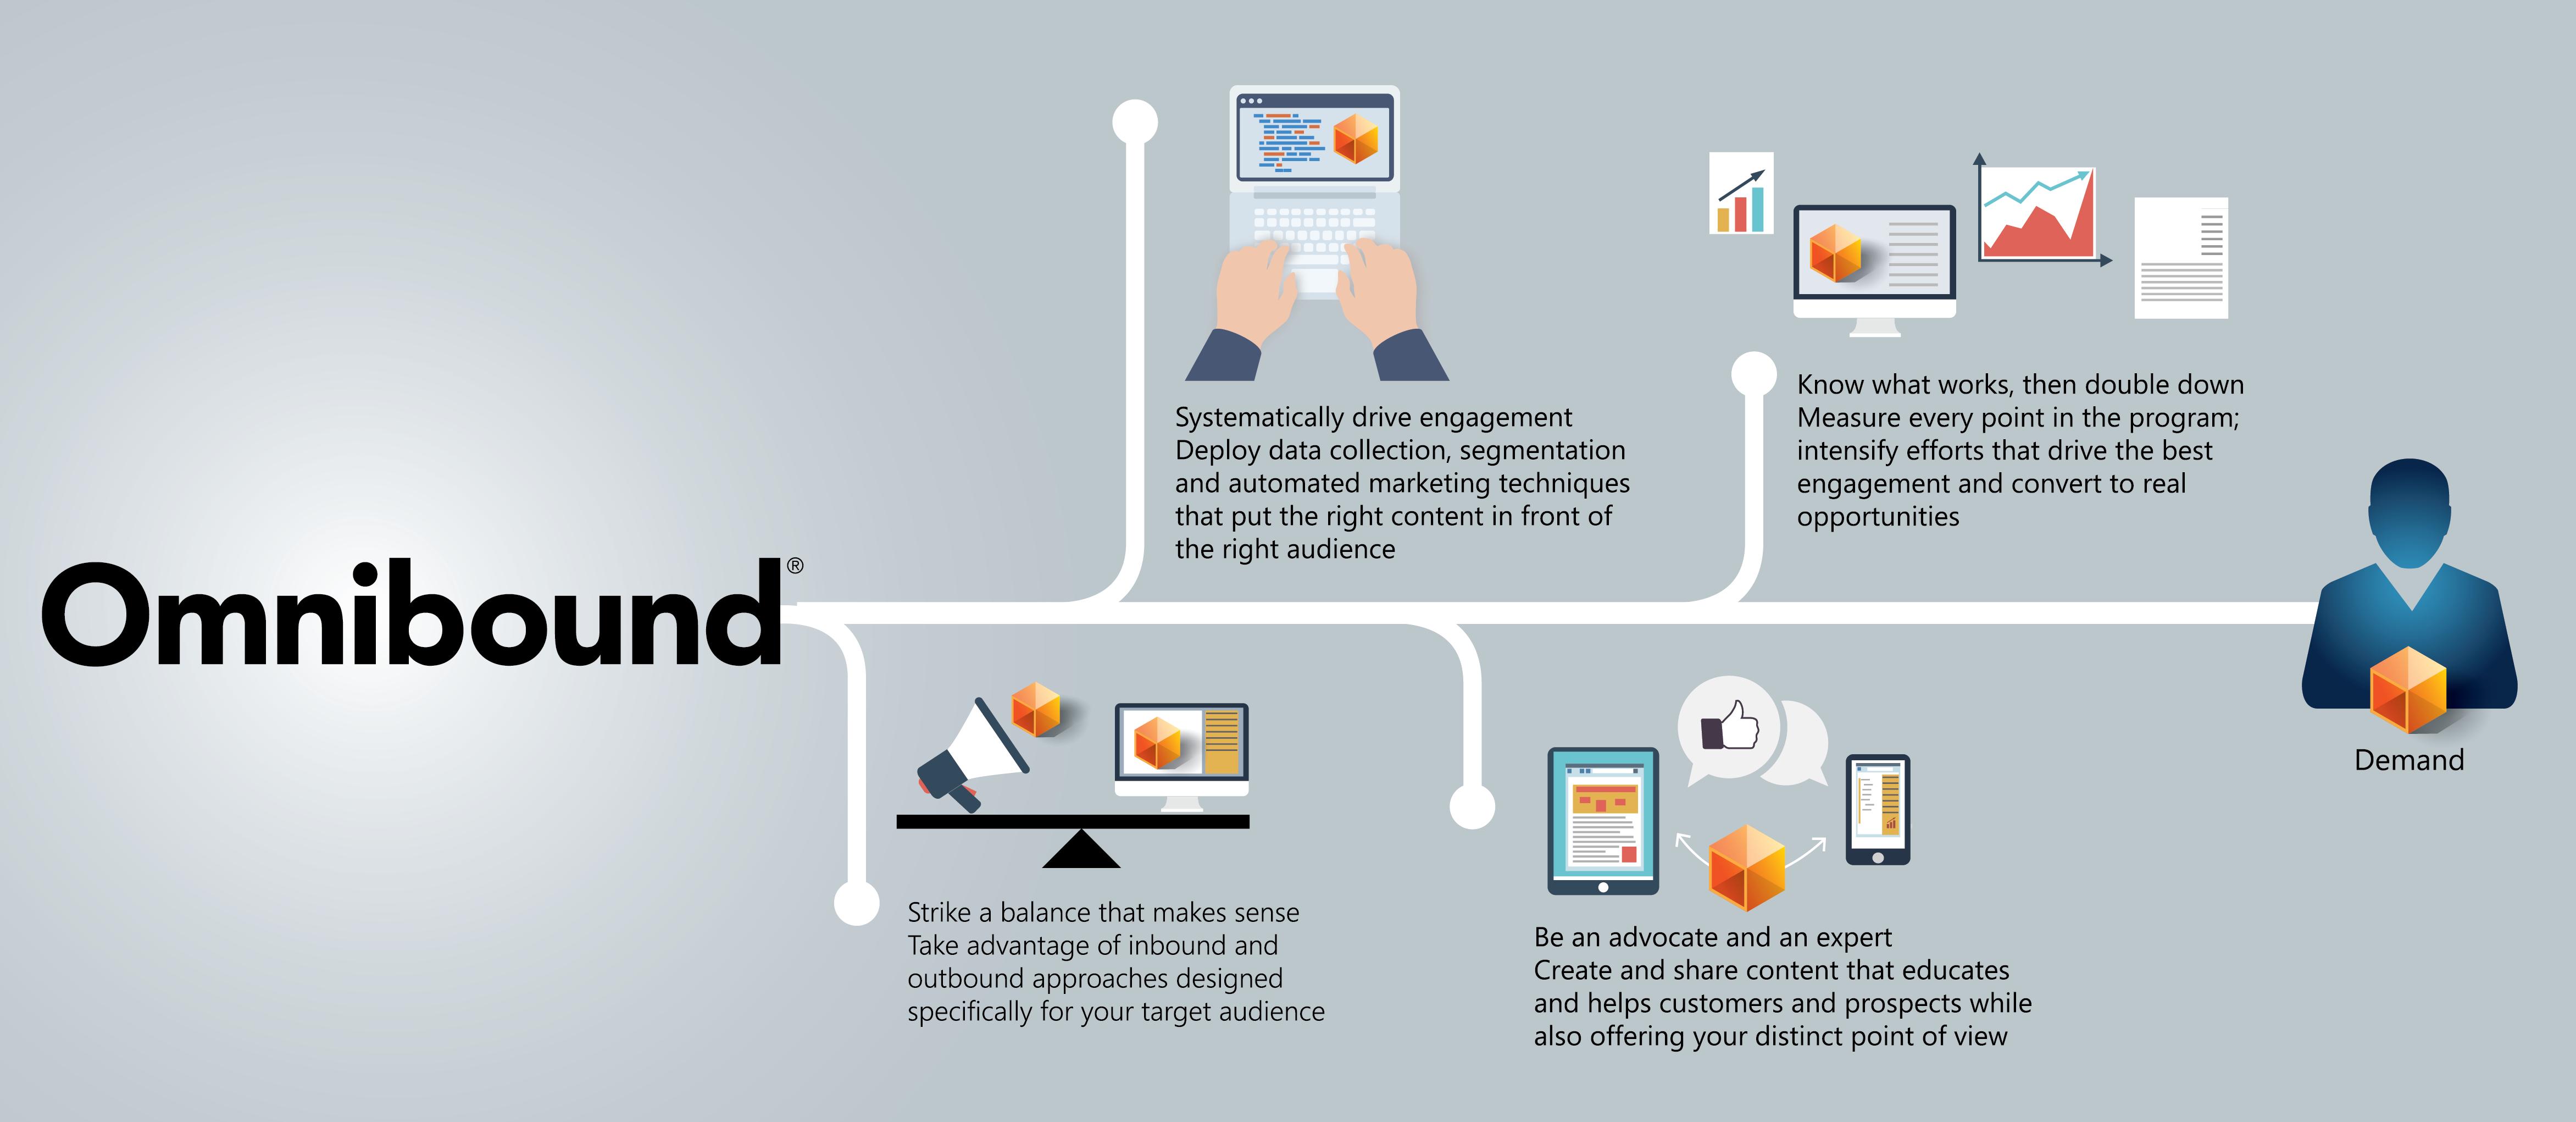 Omnibound-Infographic